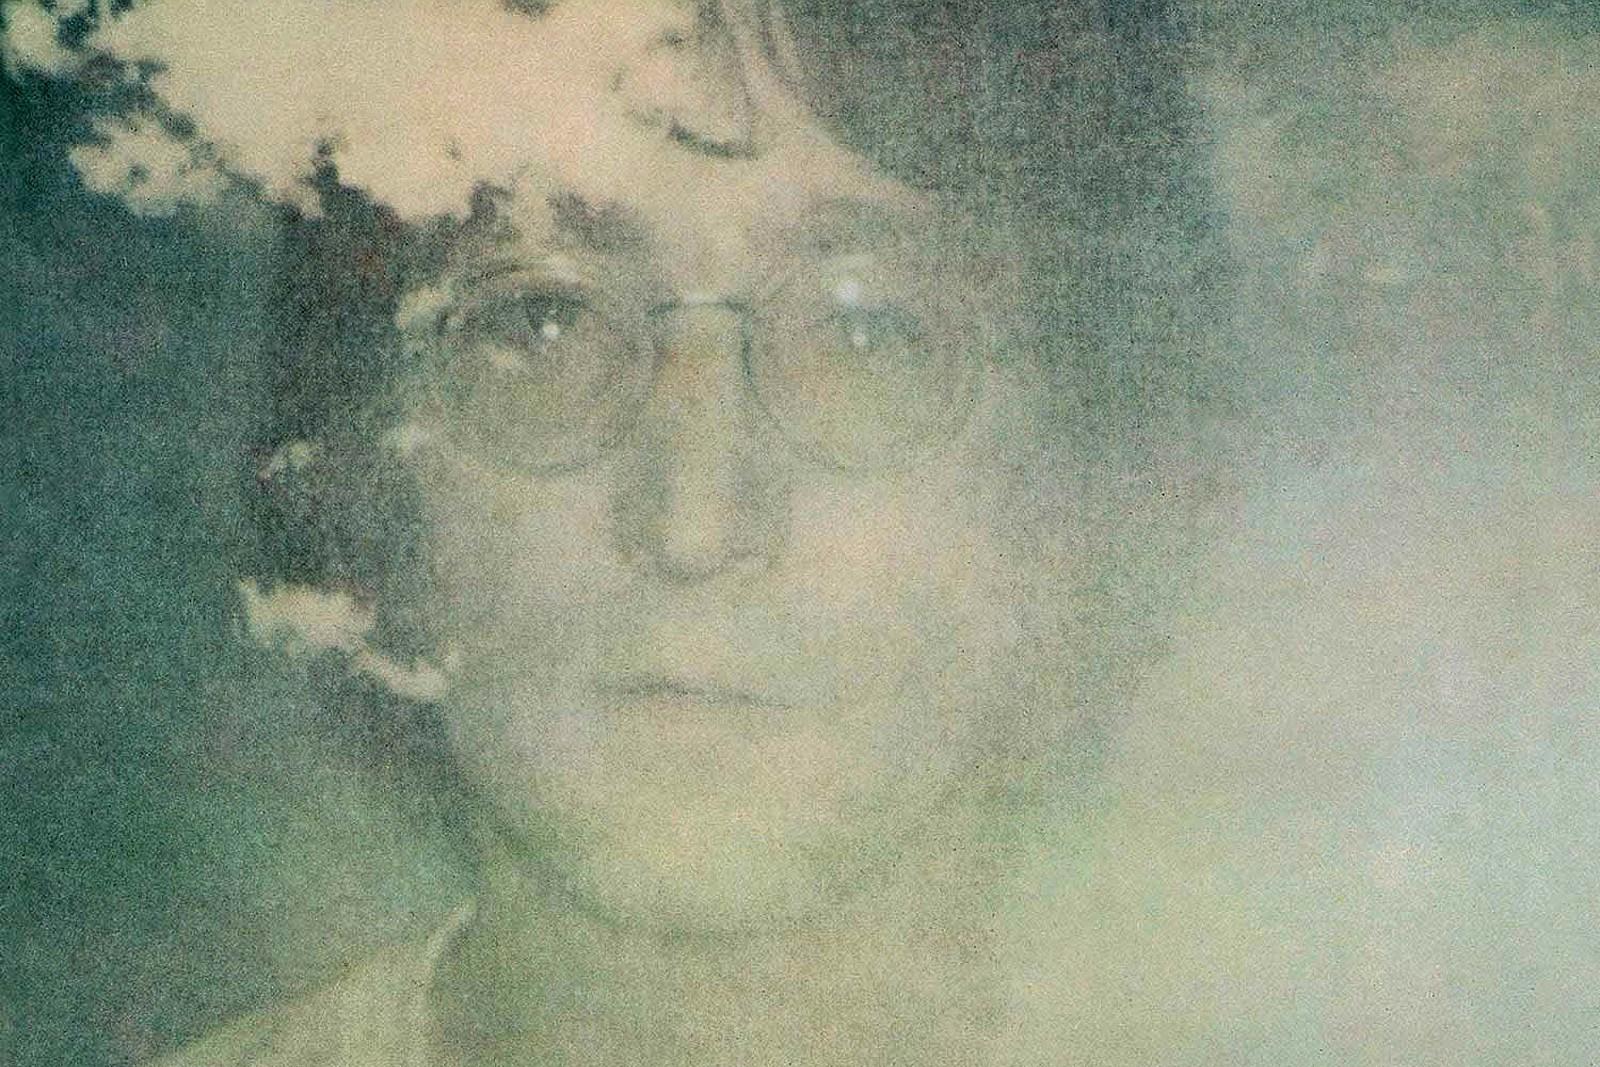 John lennon album cover with her wife naked